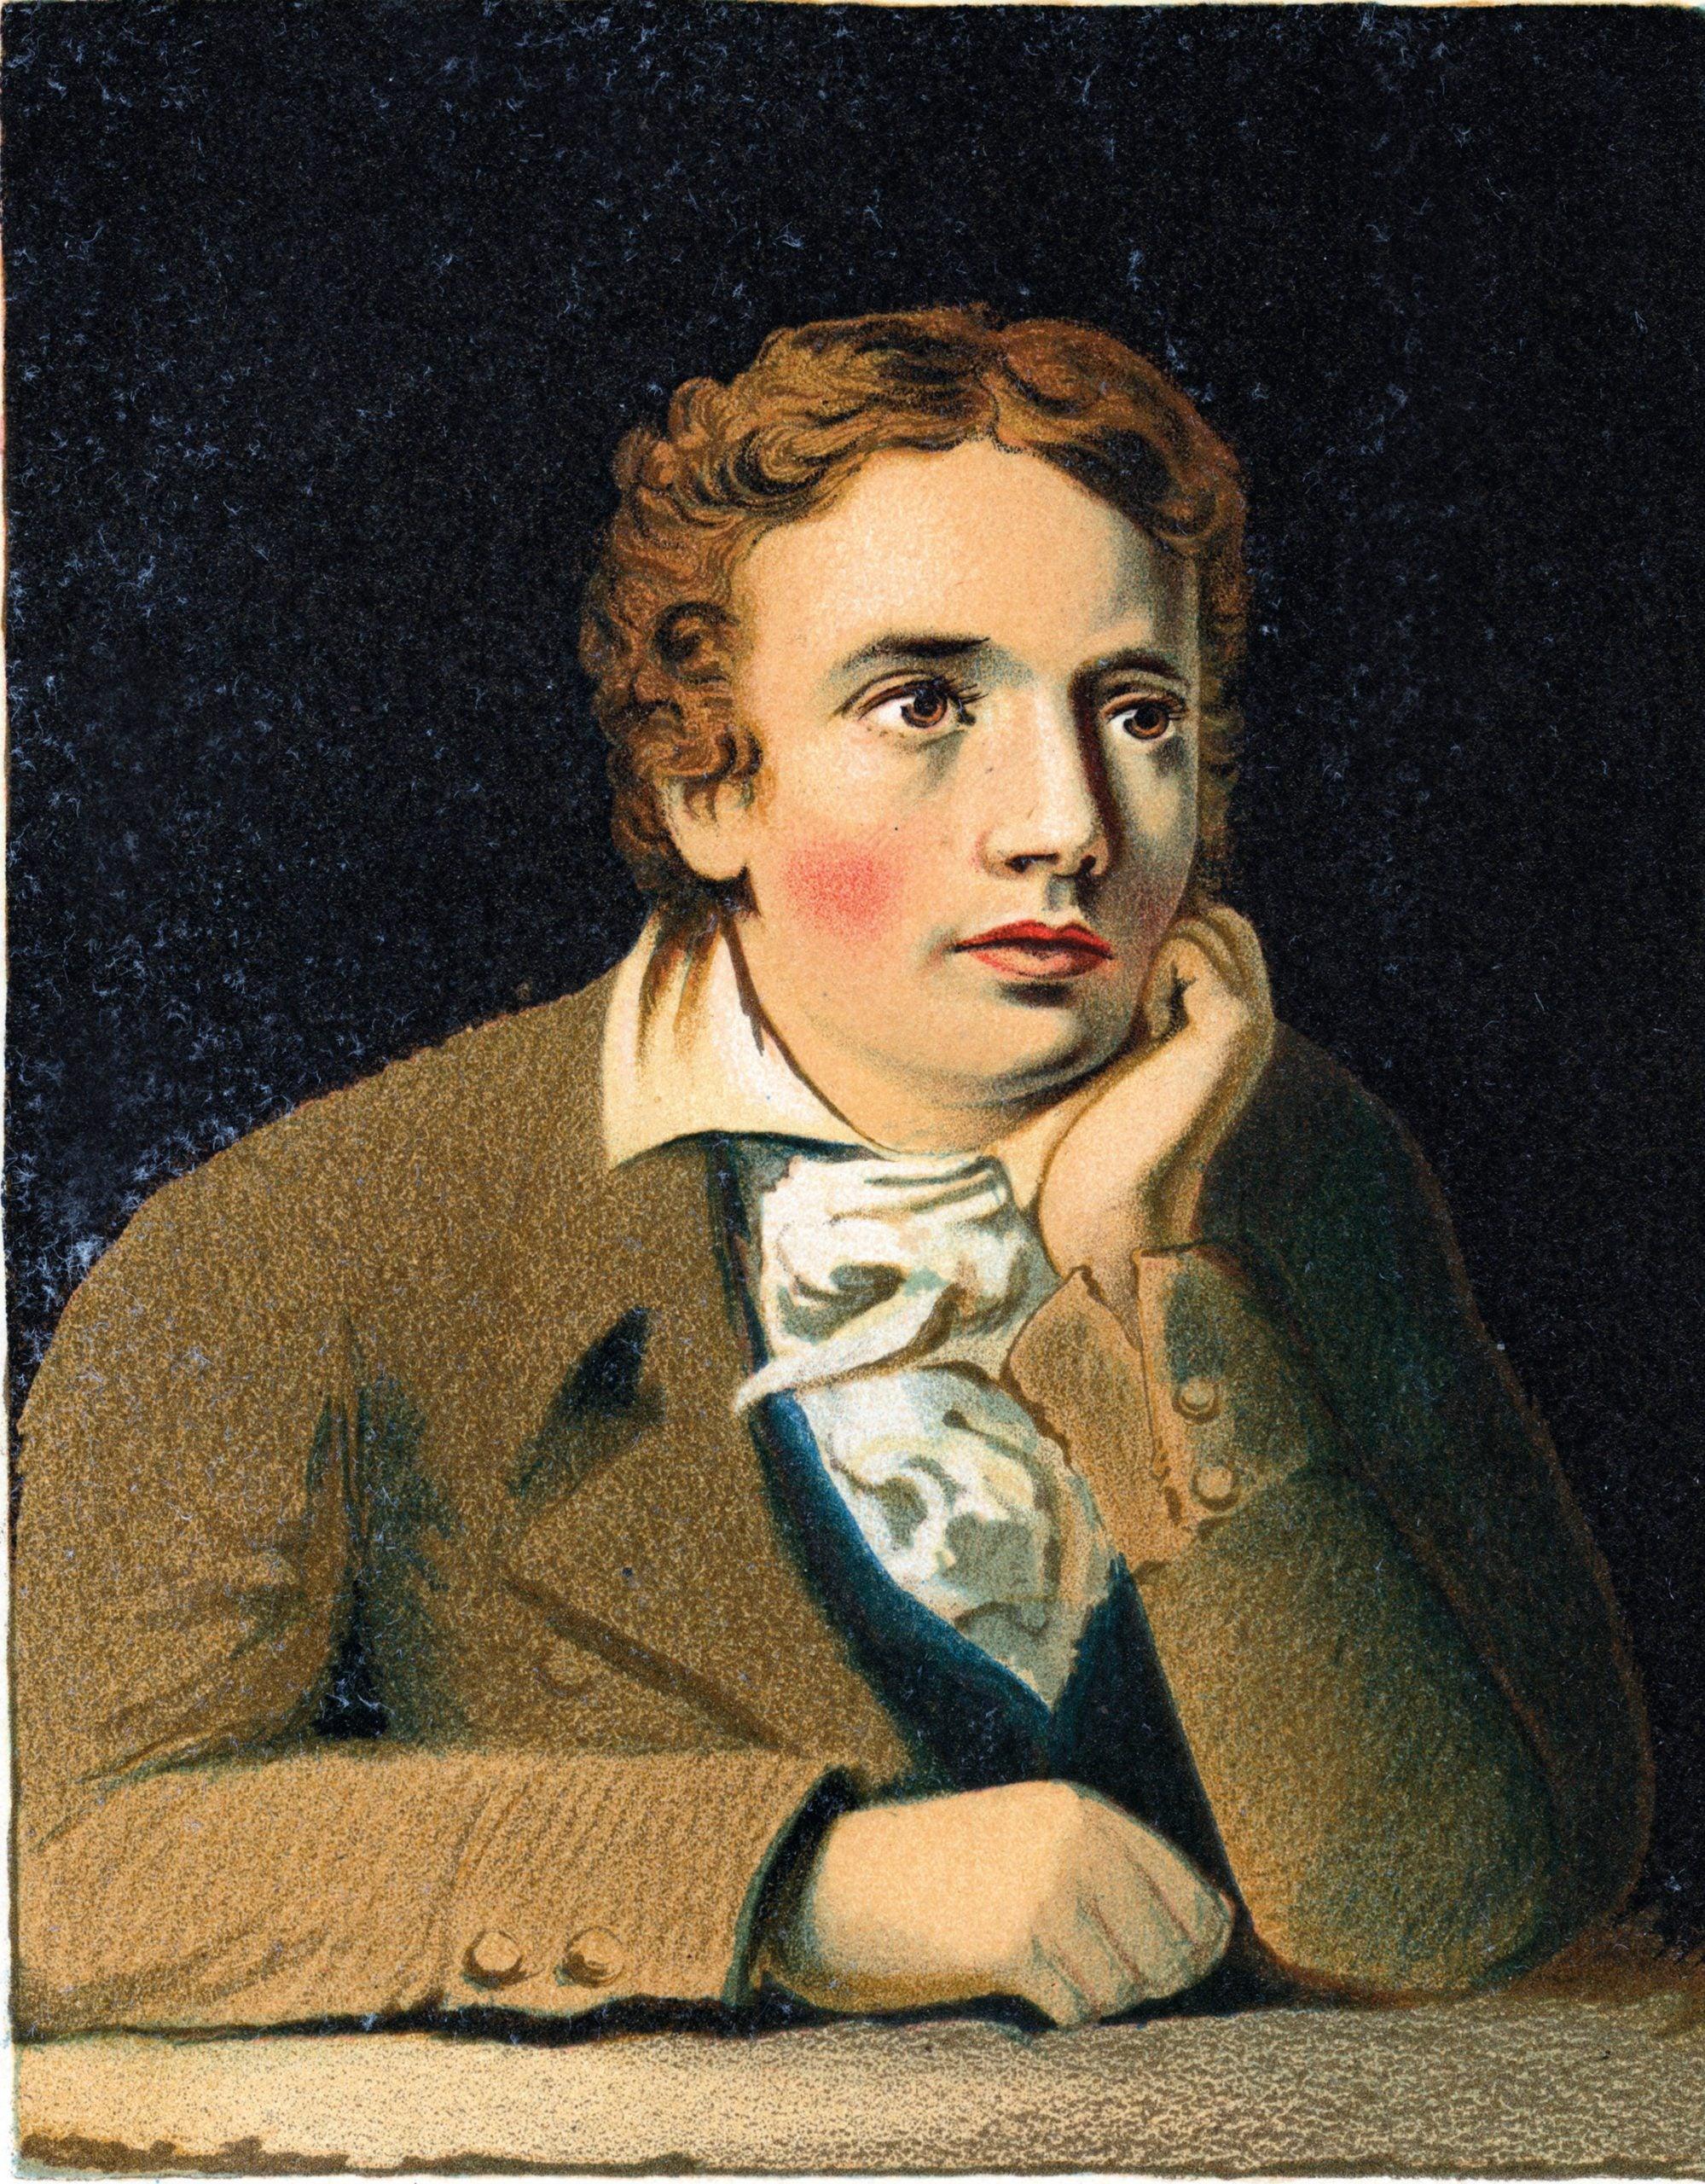 How Keats lives on